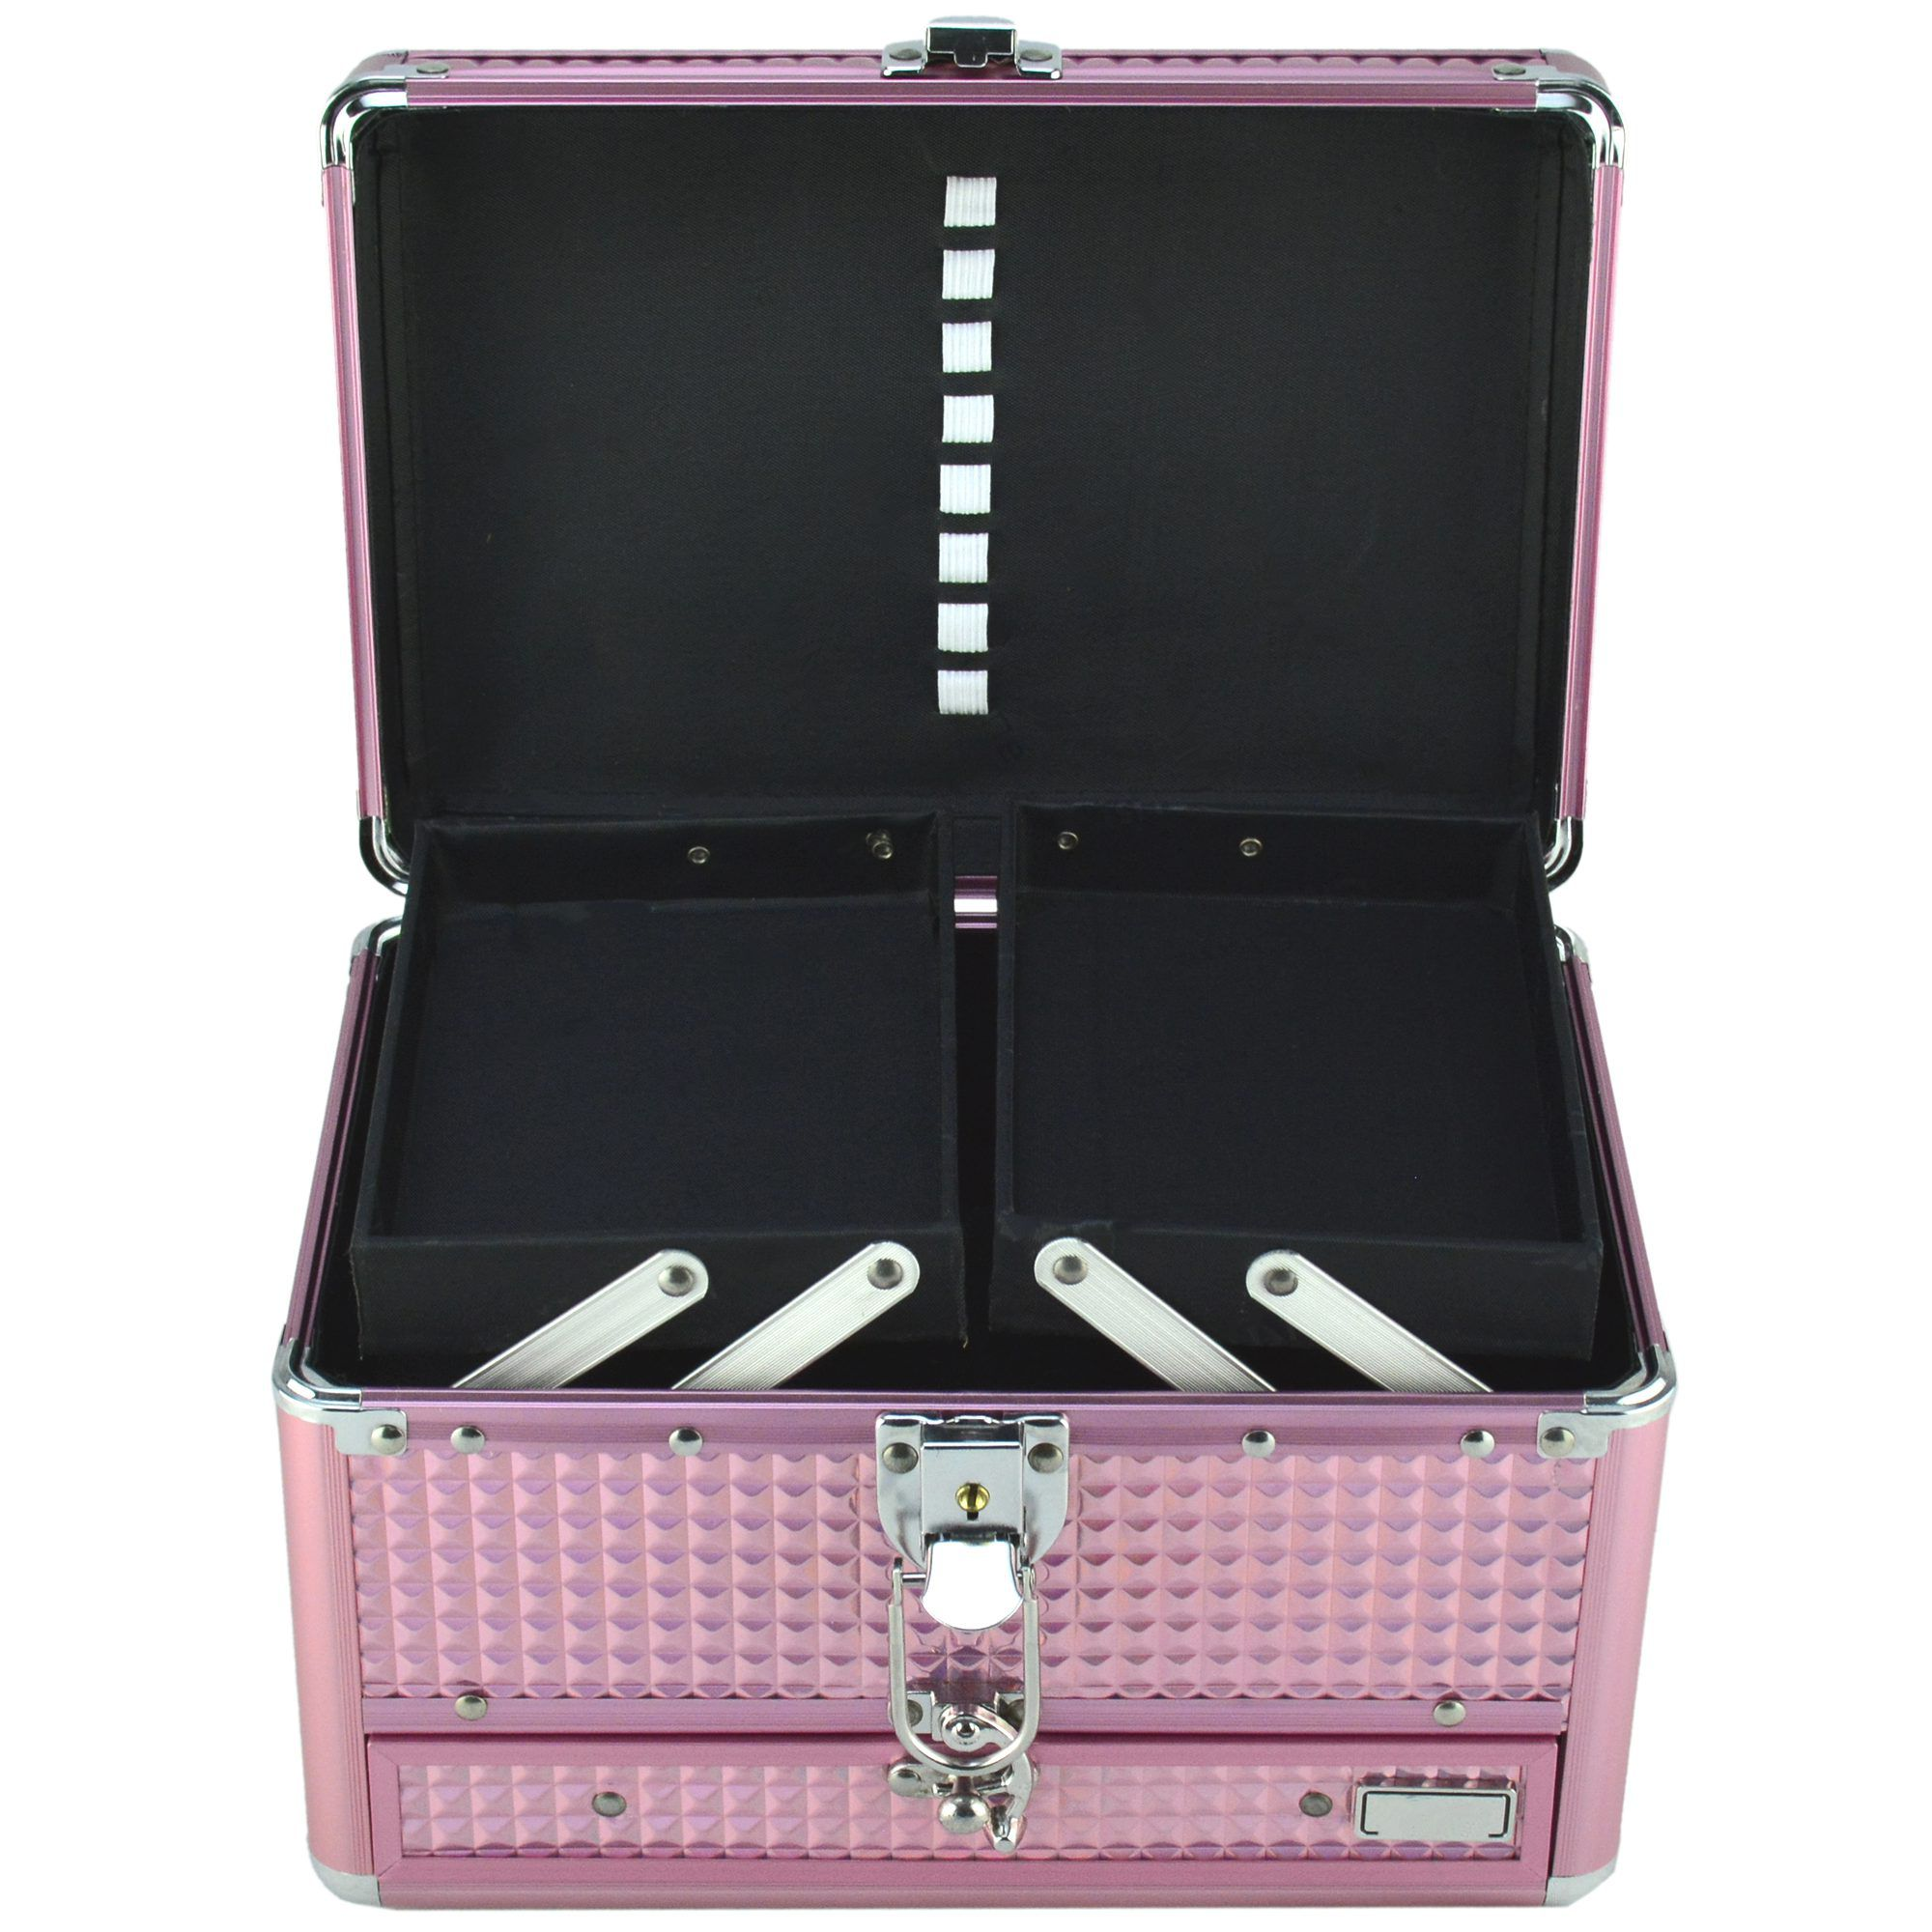 Maleta Para Maquiagem e Joias Frasqueira Luxo Rosa CBRN11124